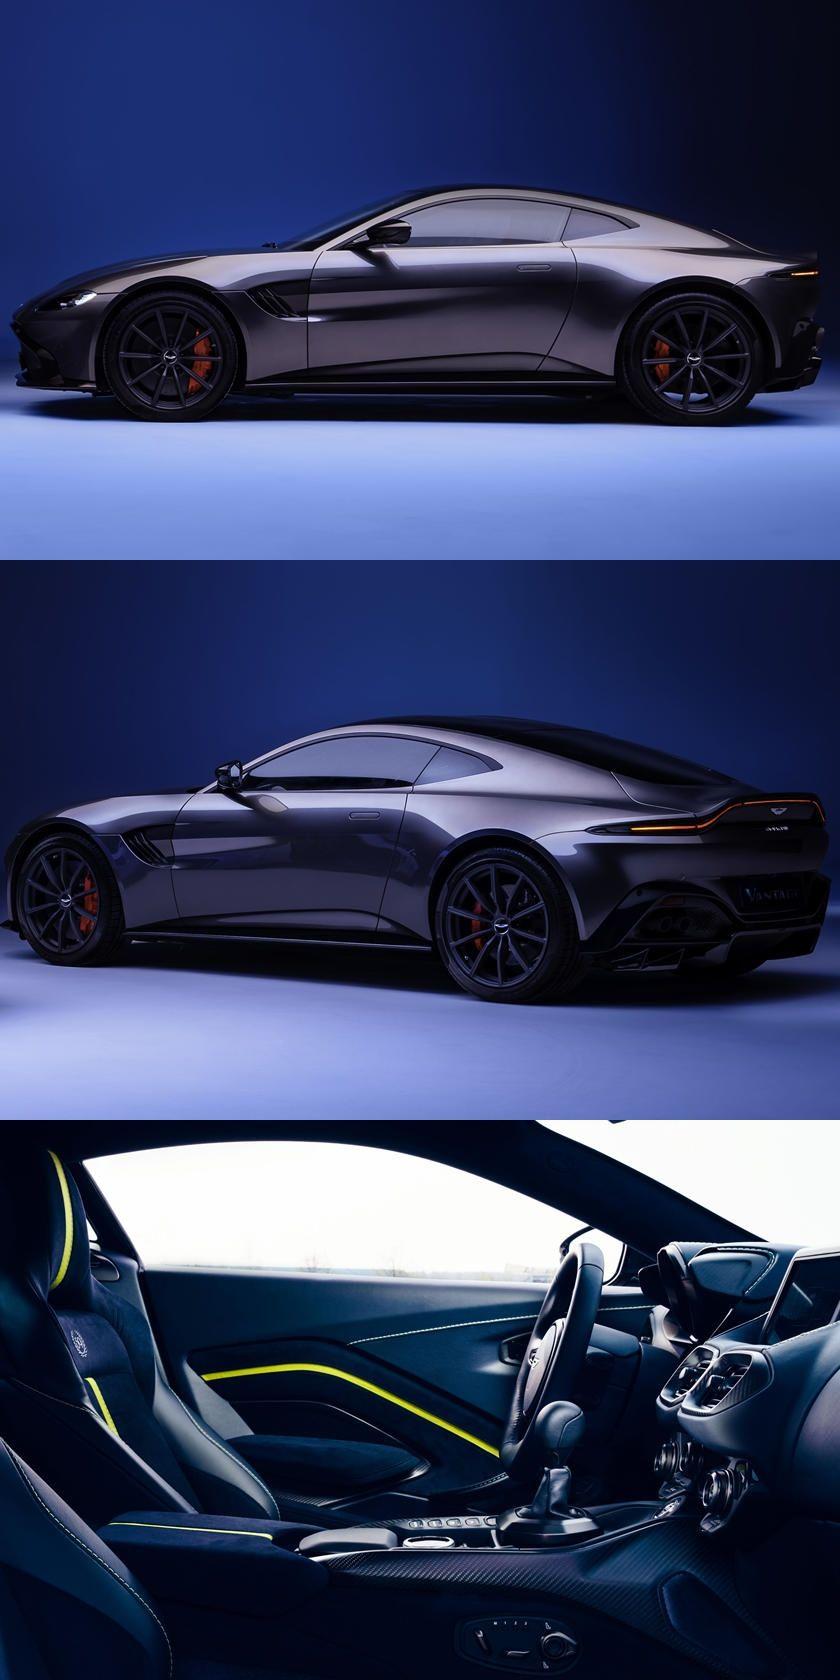 2021 Aston Martin Vantage Coupe Arrives With Manual Box Seven Speeds No Waiting Aston Martin Vantage Aston Martin Aston